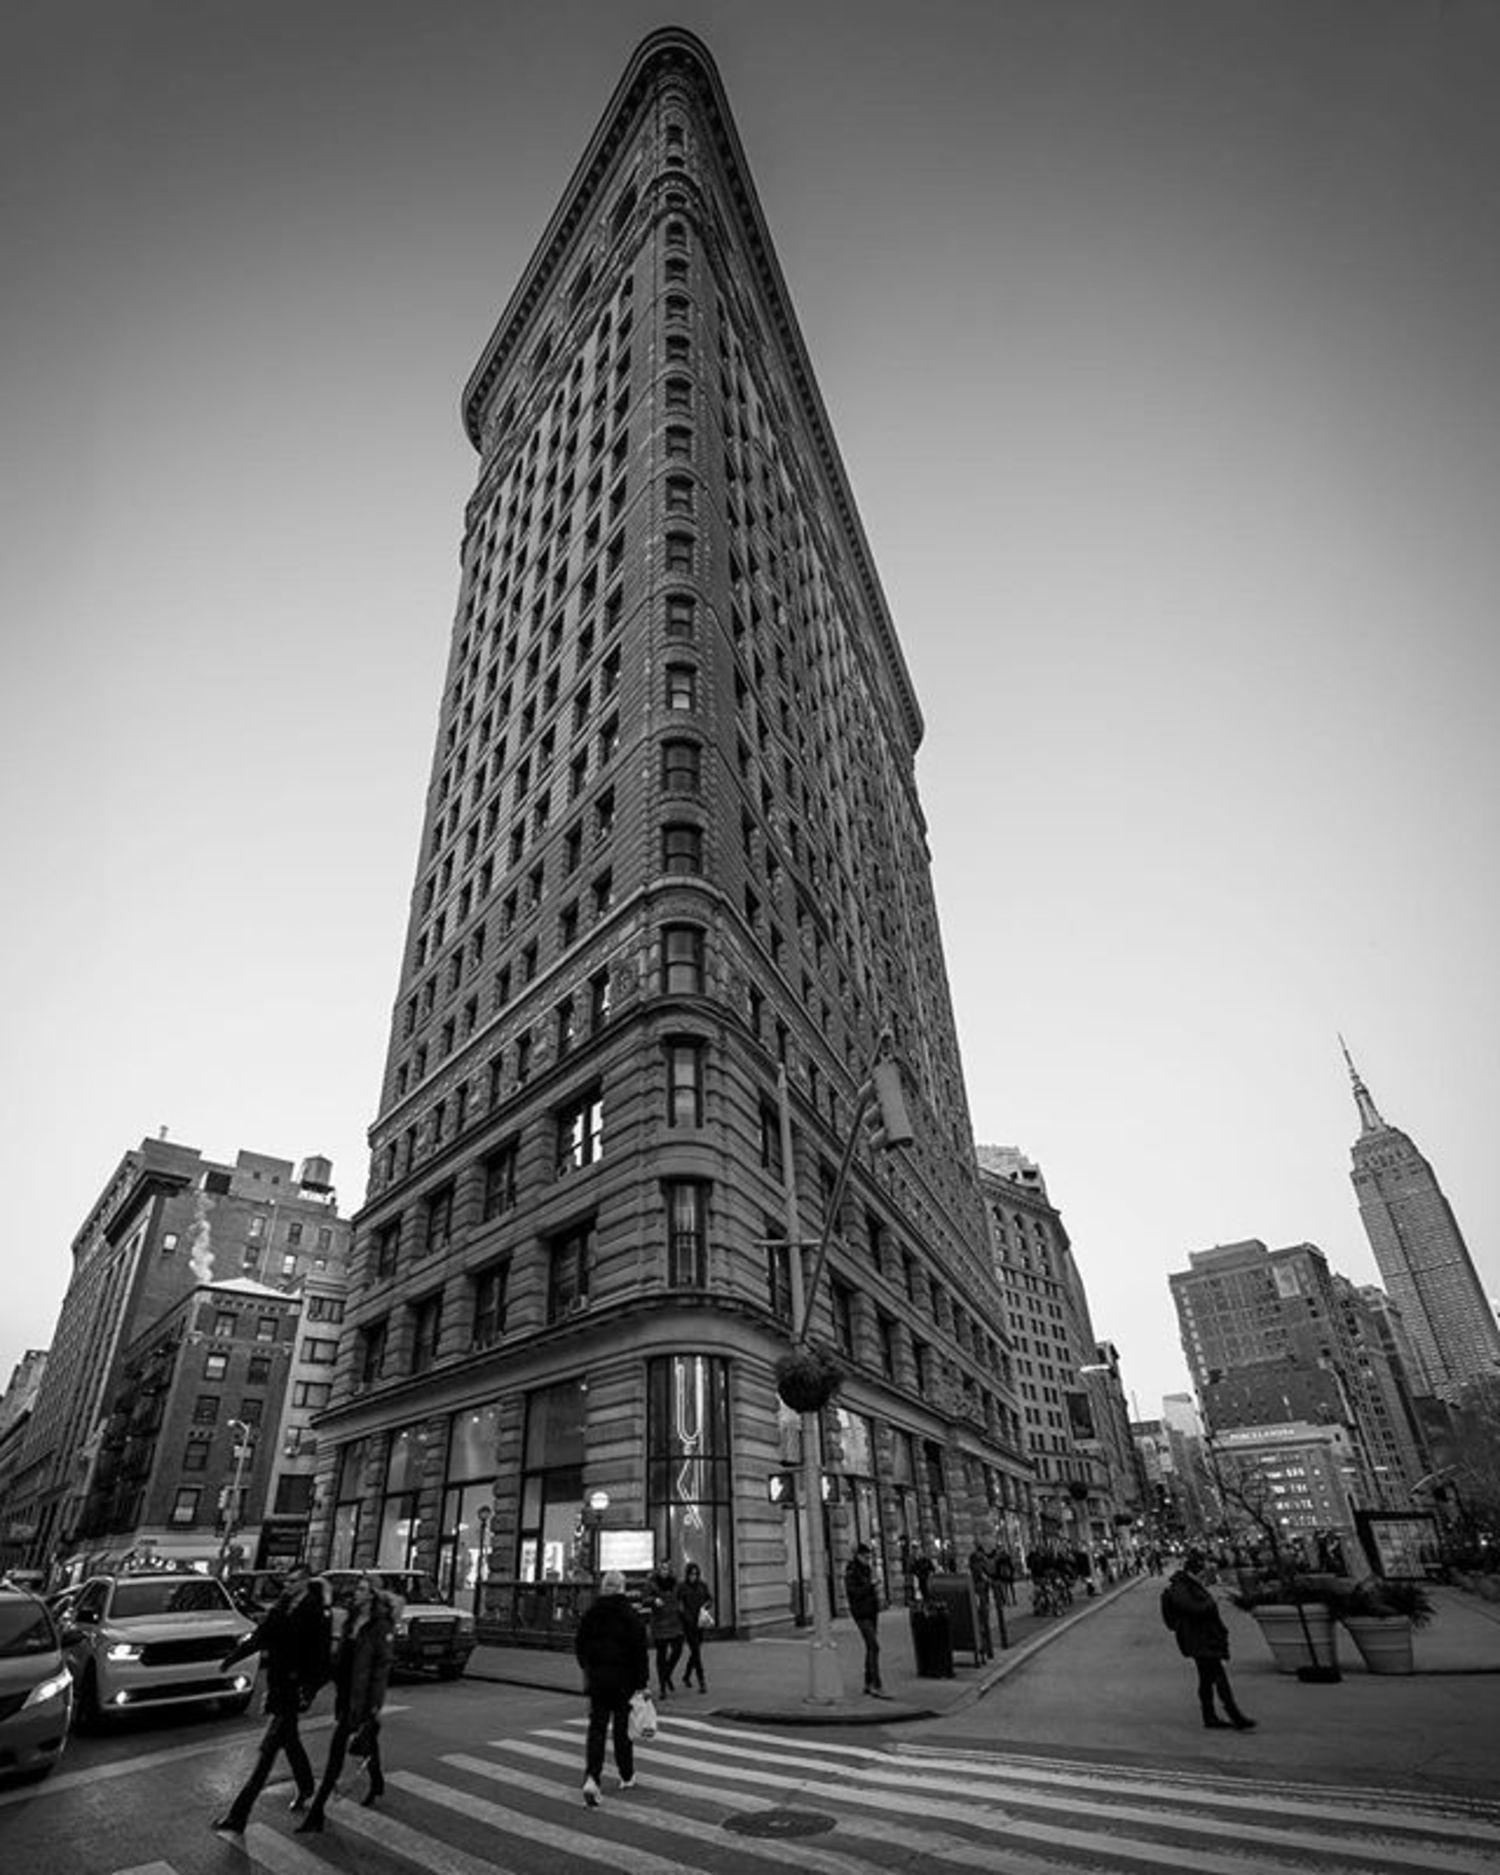 Flatiron Building, New York. Photo via @chief770 #viewingnyc #newyork #newyorkcity #nyc #flatironbuilding #empirestatebuilding